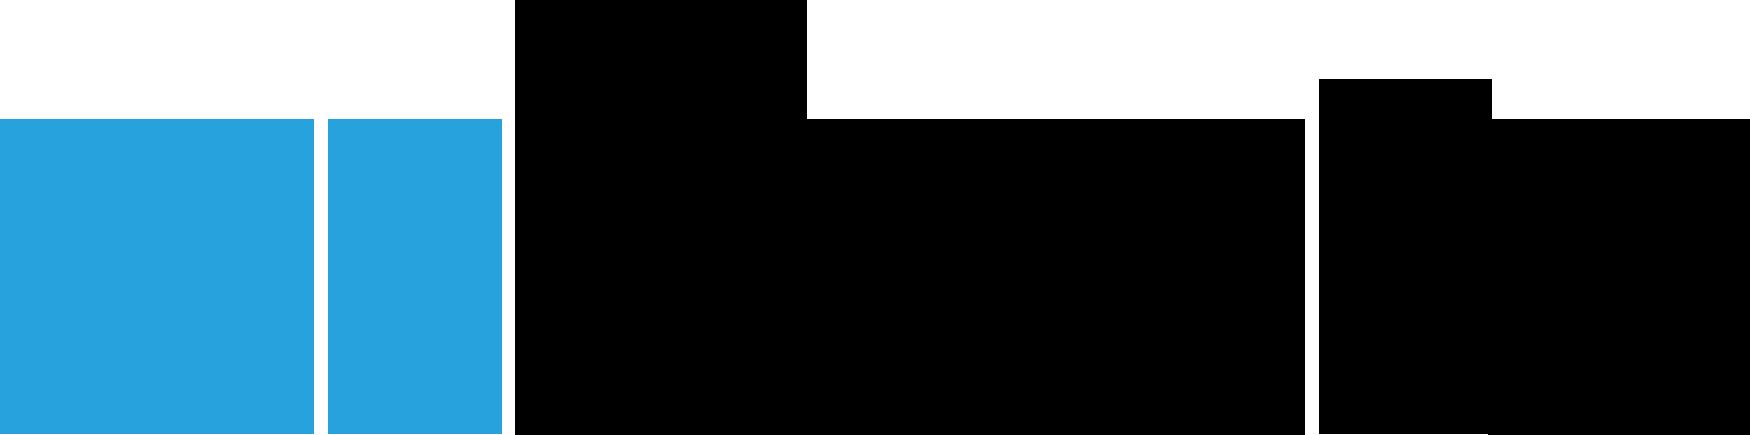 Orbotix logo.png